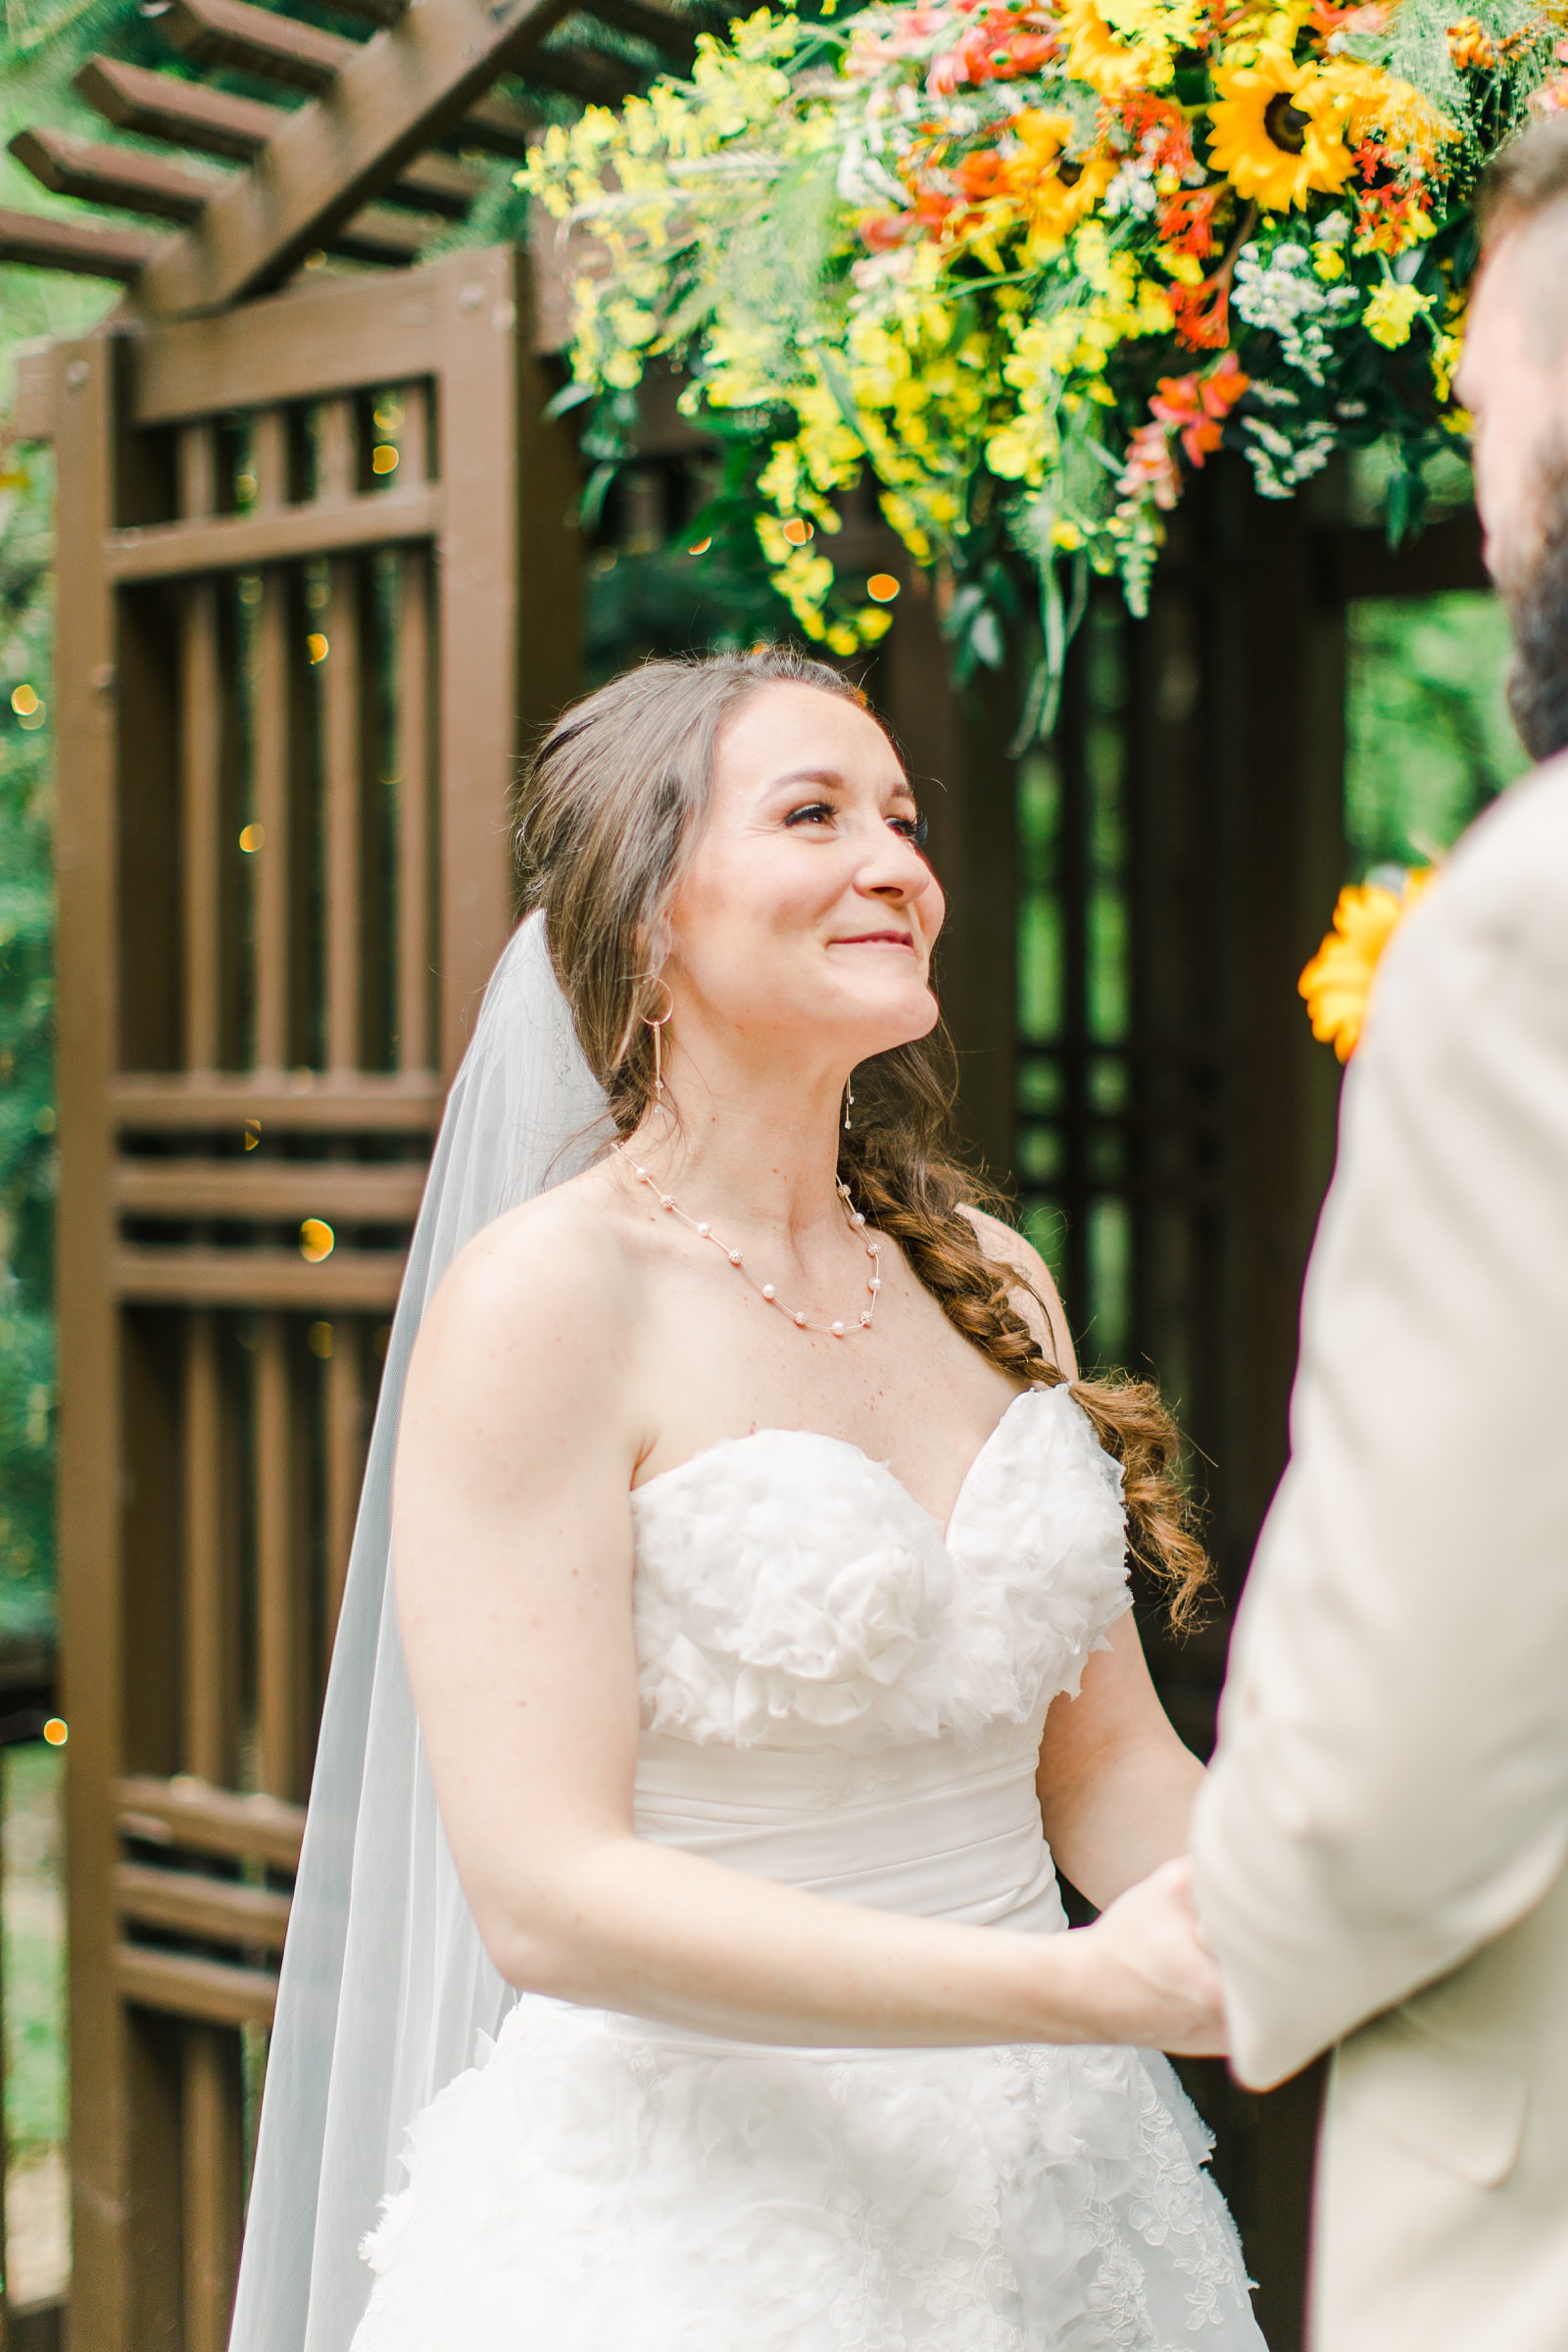 Millcreek Inn Summer Wedding, Utah wedding photography Millcreek Canyon, Salt Lake City, mountain ceremony, bride's vows